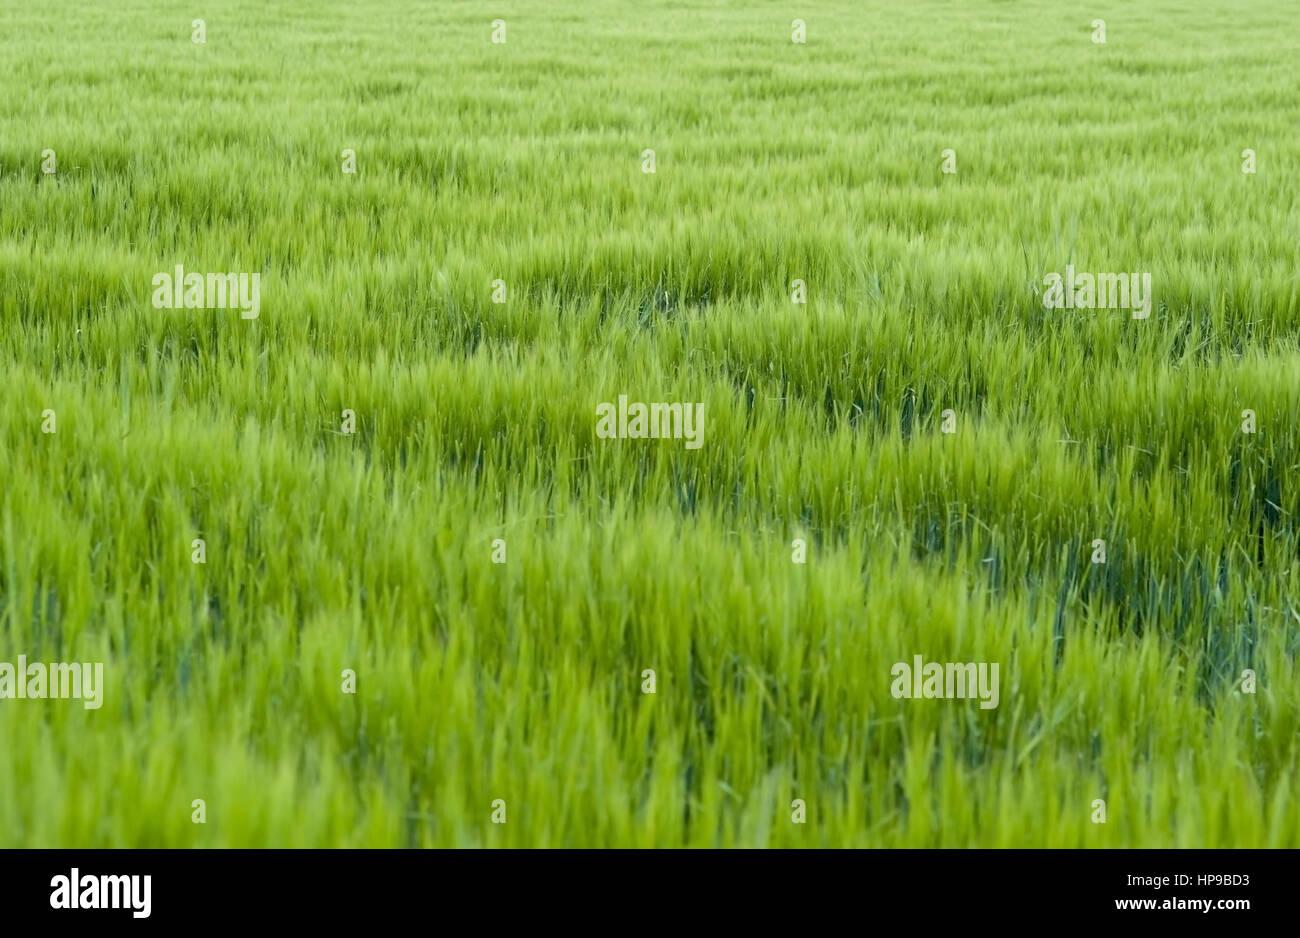 Gruenes Getreidefeld, Fruehsommer - green cornfield Stock Photo